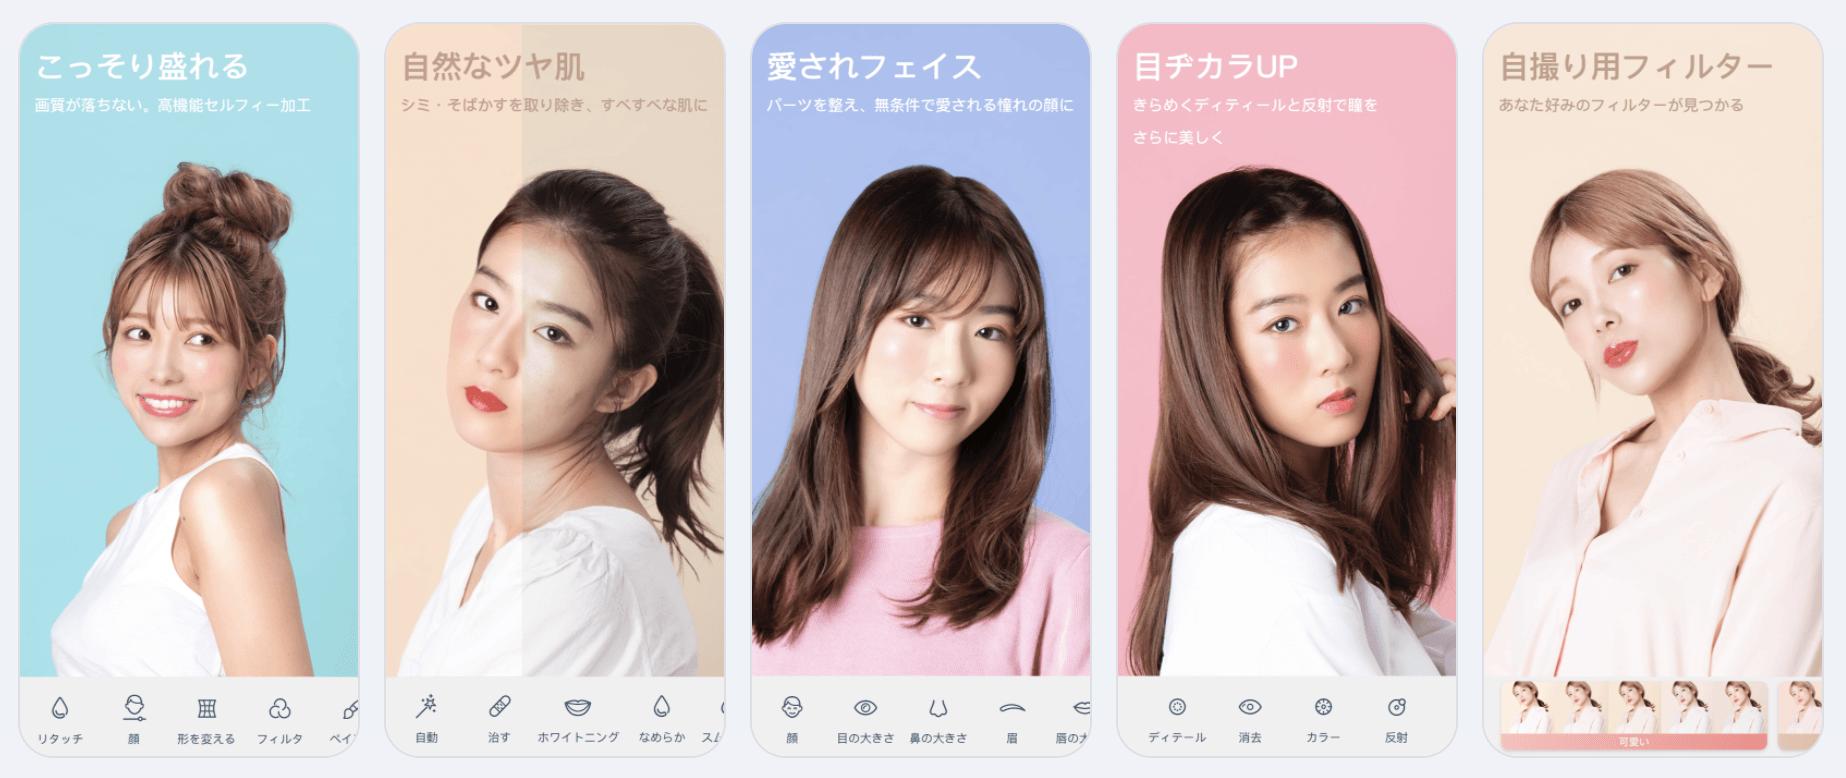 Facetune Japan Screenshots De